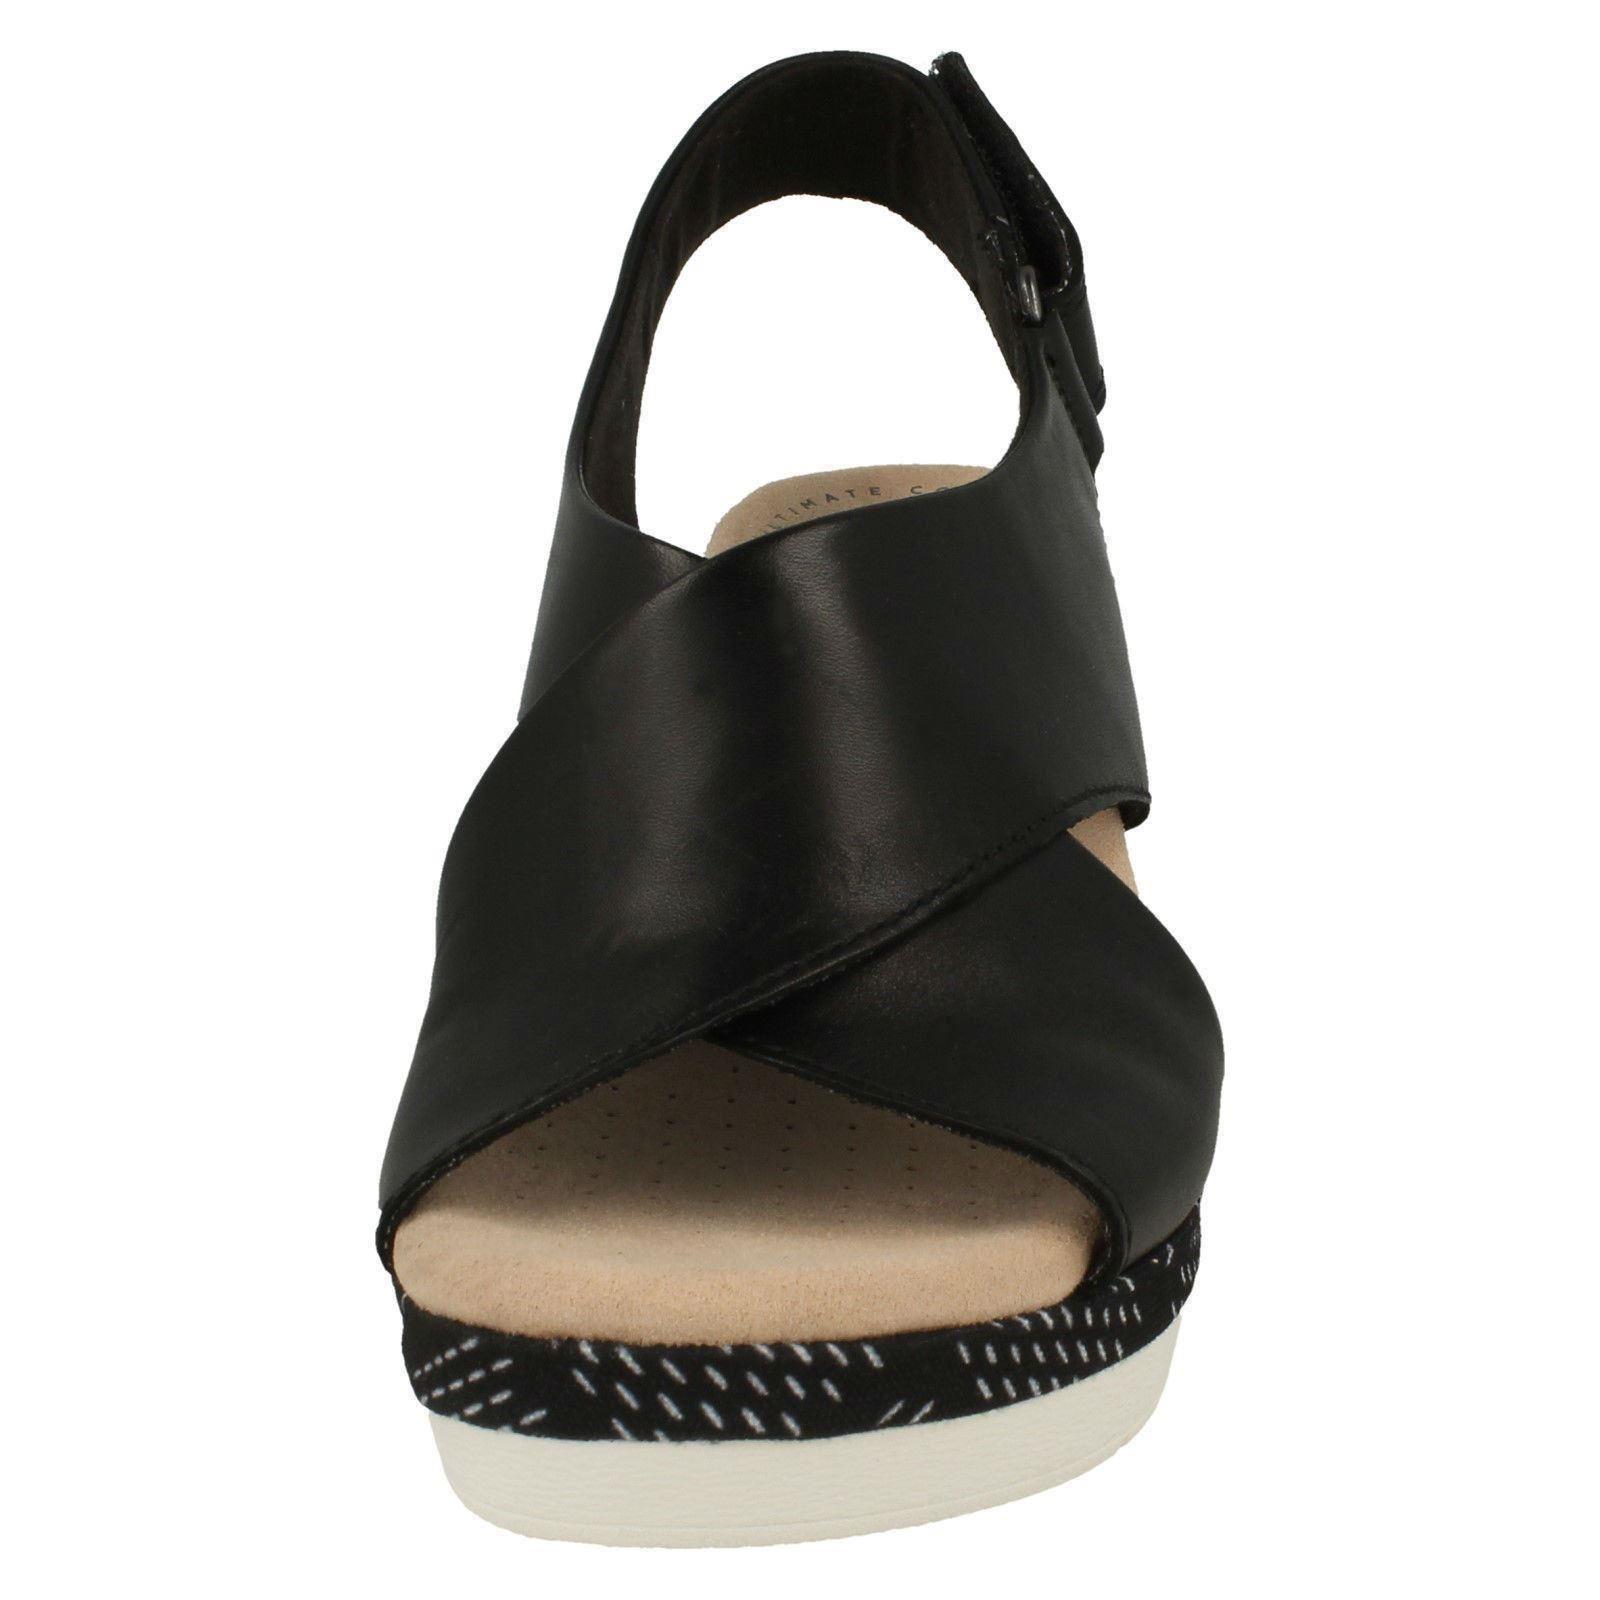 Ladies Clarks Wedge Wedge Wedge Heeled Slingback Sandals - Cammy Pearl 6ea9ad